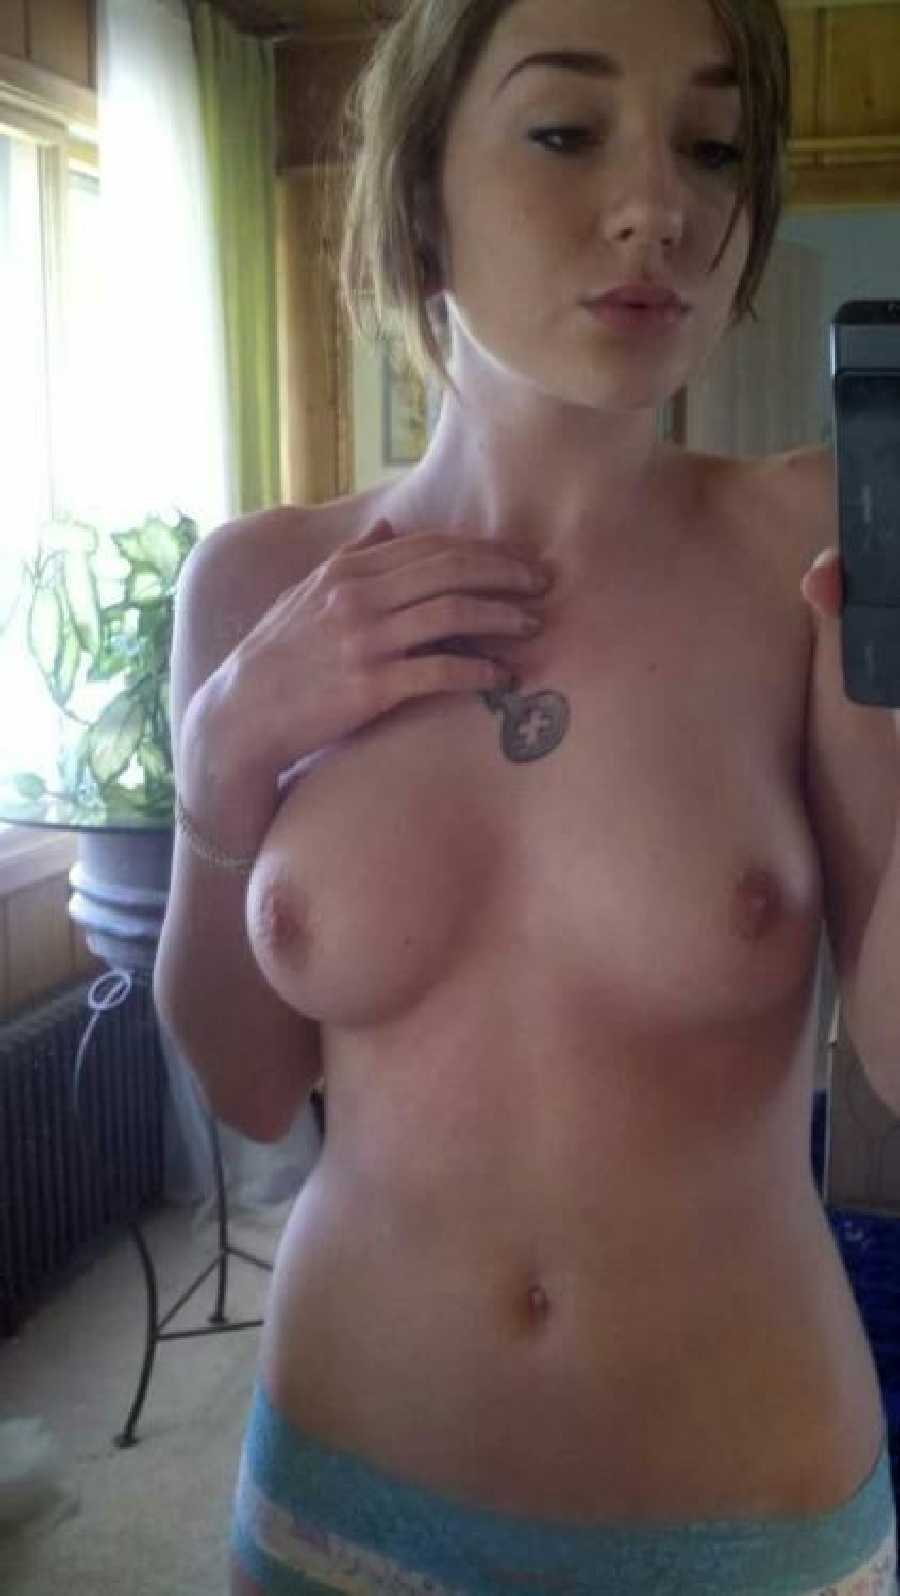 My gf naked pics